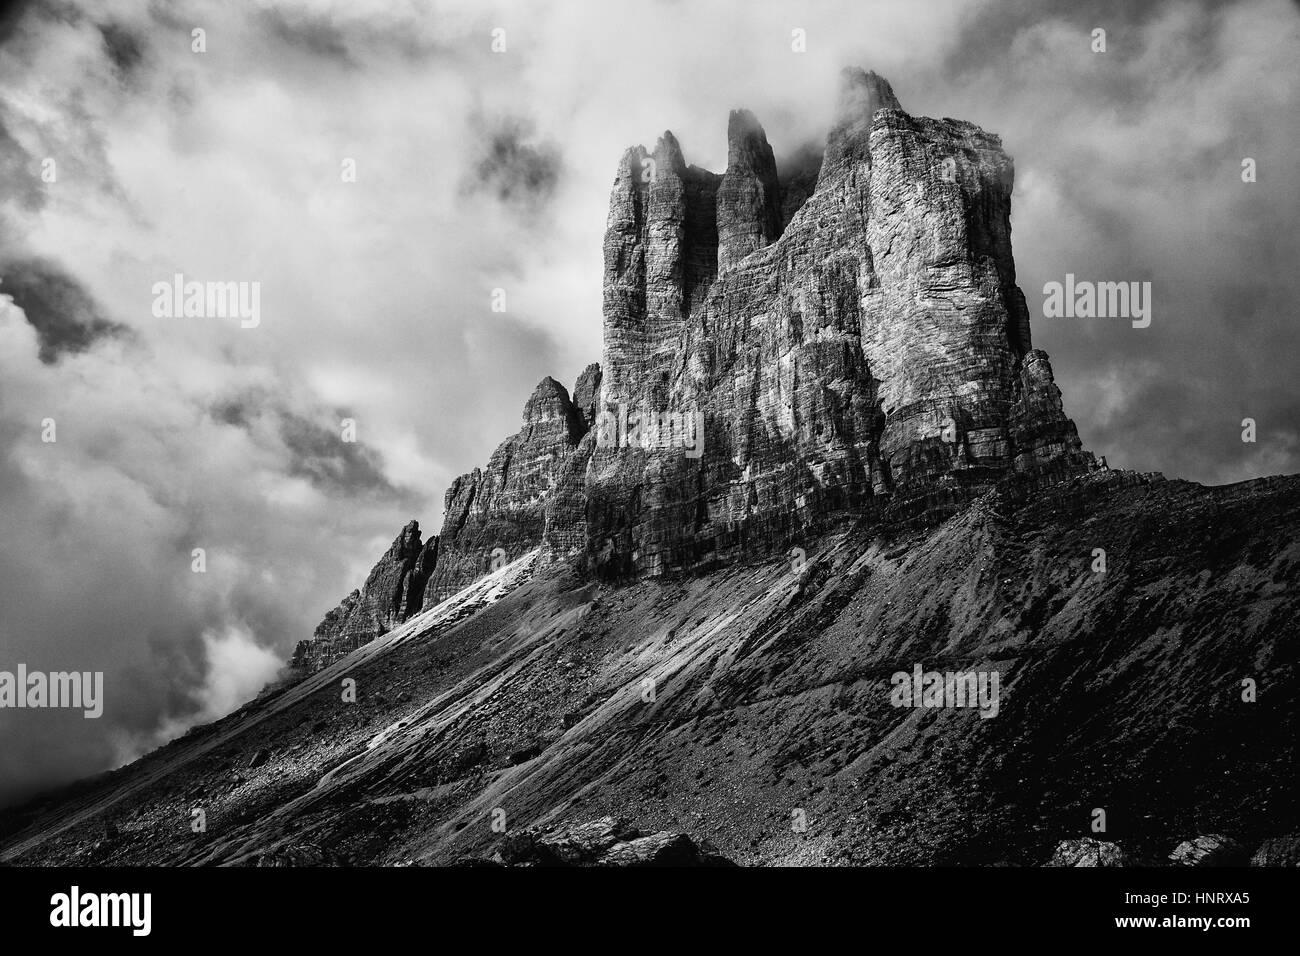 Dolomites mountain panorama - Stock Image